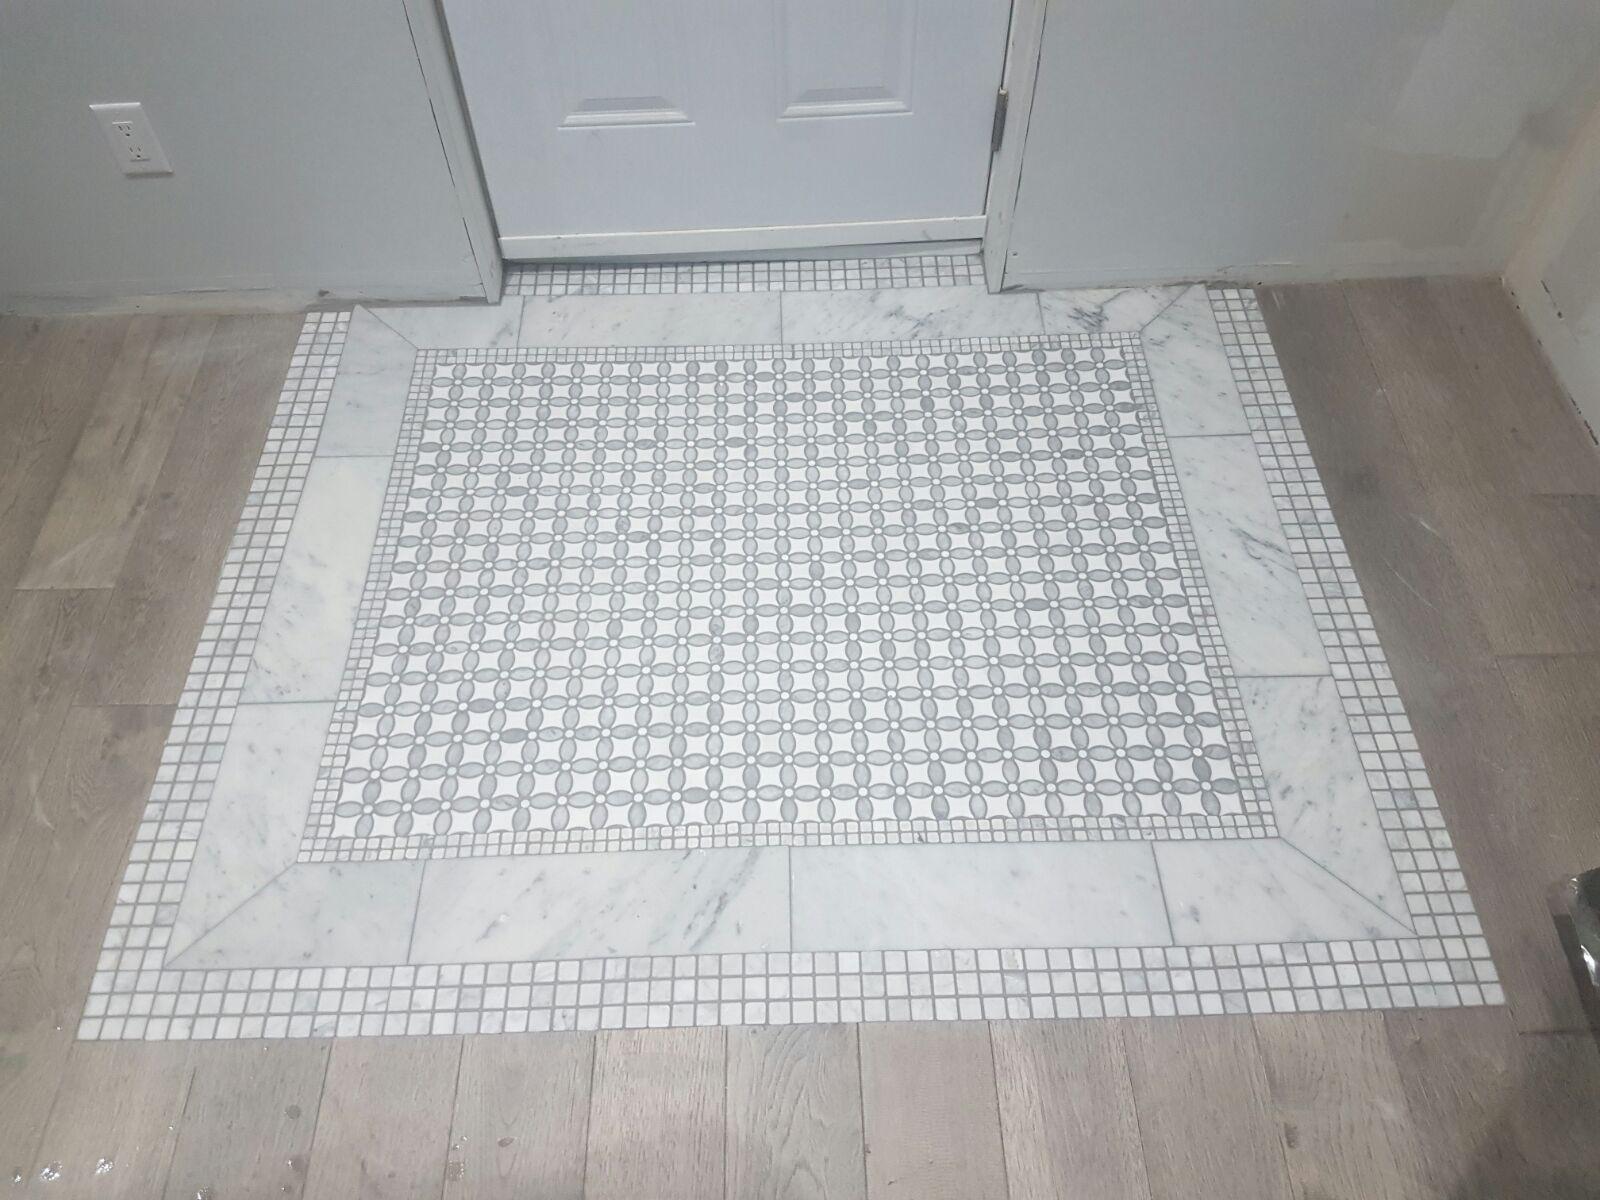 Marble Mosaic Insert M2tilestone Toronto Tile Tiles Tiletrends Renovation Kitchen Bathroom Interiordesign Int Mosaic Insert Tile Trends Marble Mosaic